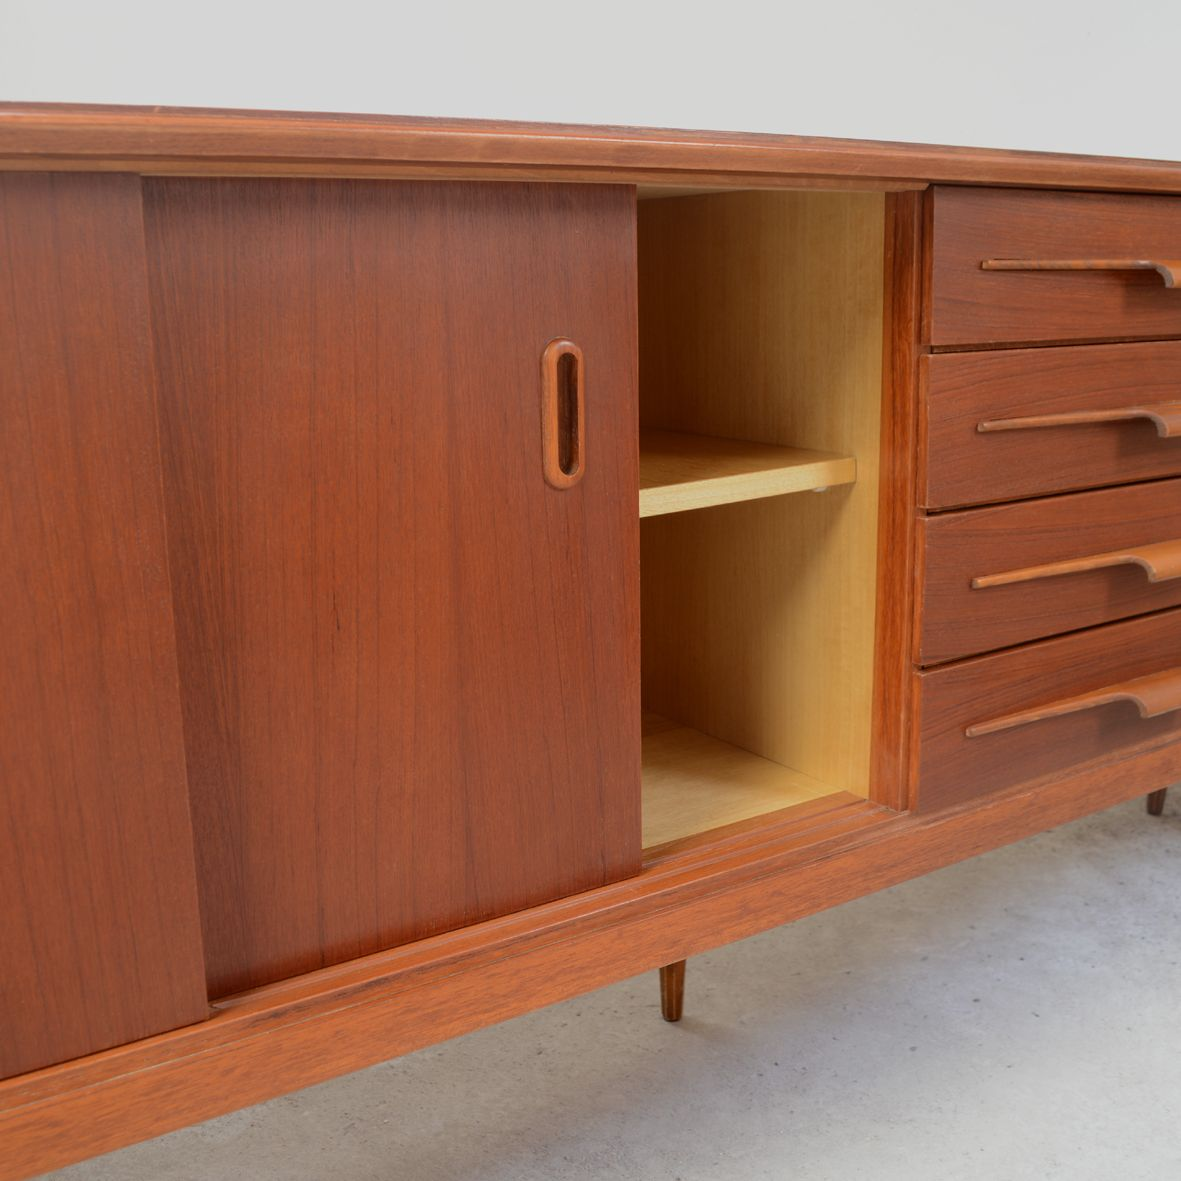 Scandinavian long teak veneer cabinet 1960s for sale at for 1960 kitchen cabinets for sale